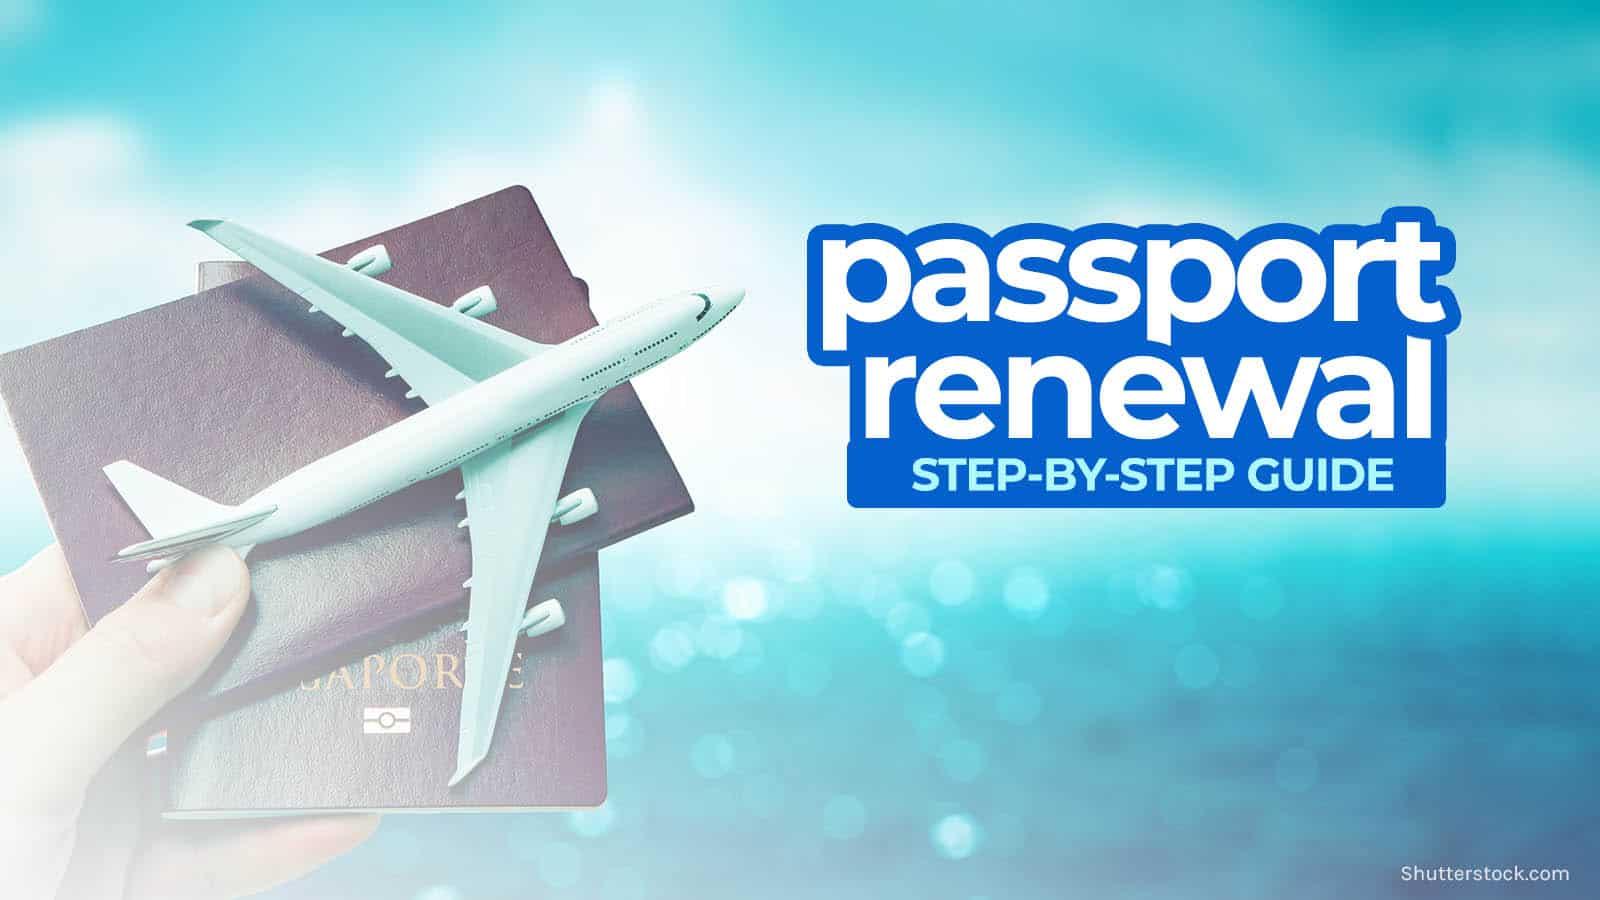 PHILIPPINE PASSPORT RENEWAL: Requirements & DFA Application